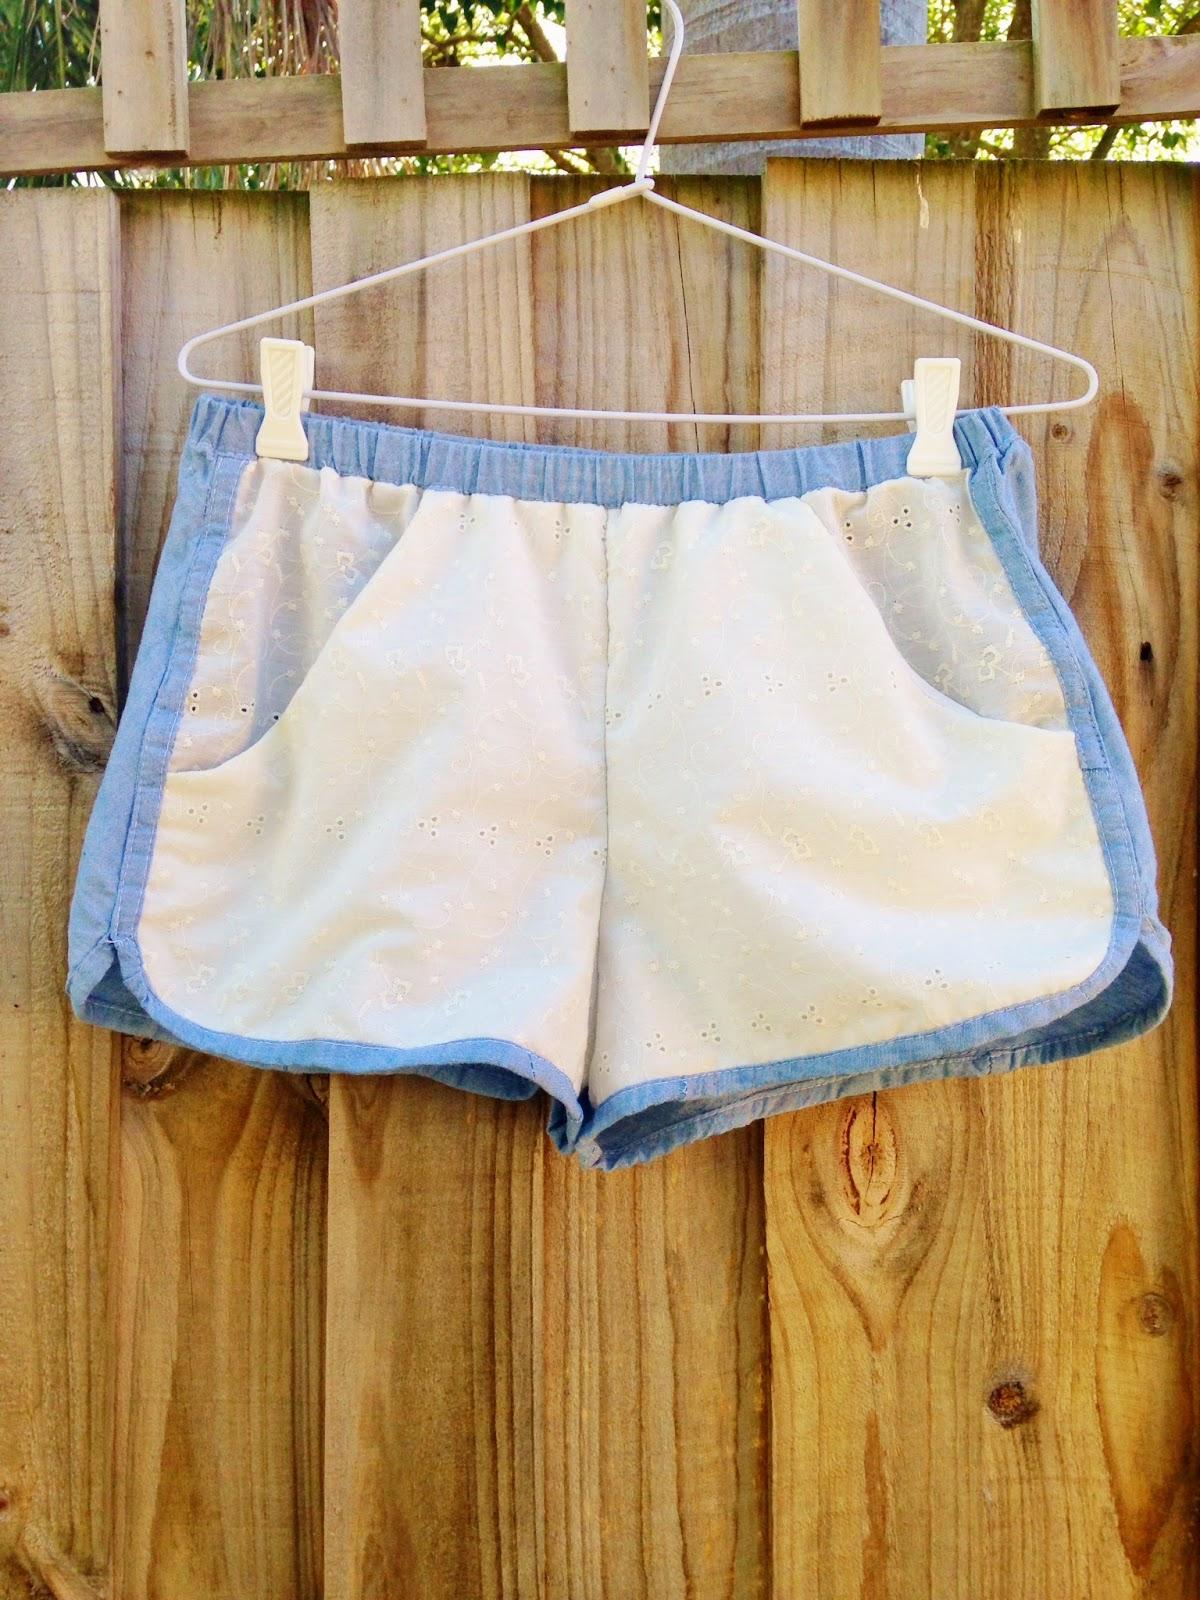 http://mel-allwrappedup.blogspot.com.au/2015/02/not-so-city-gym-shorts.html